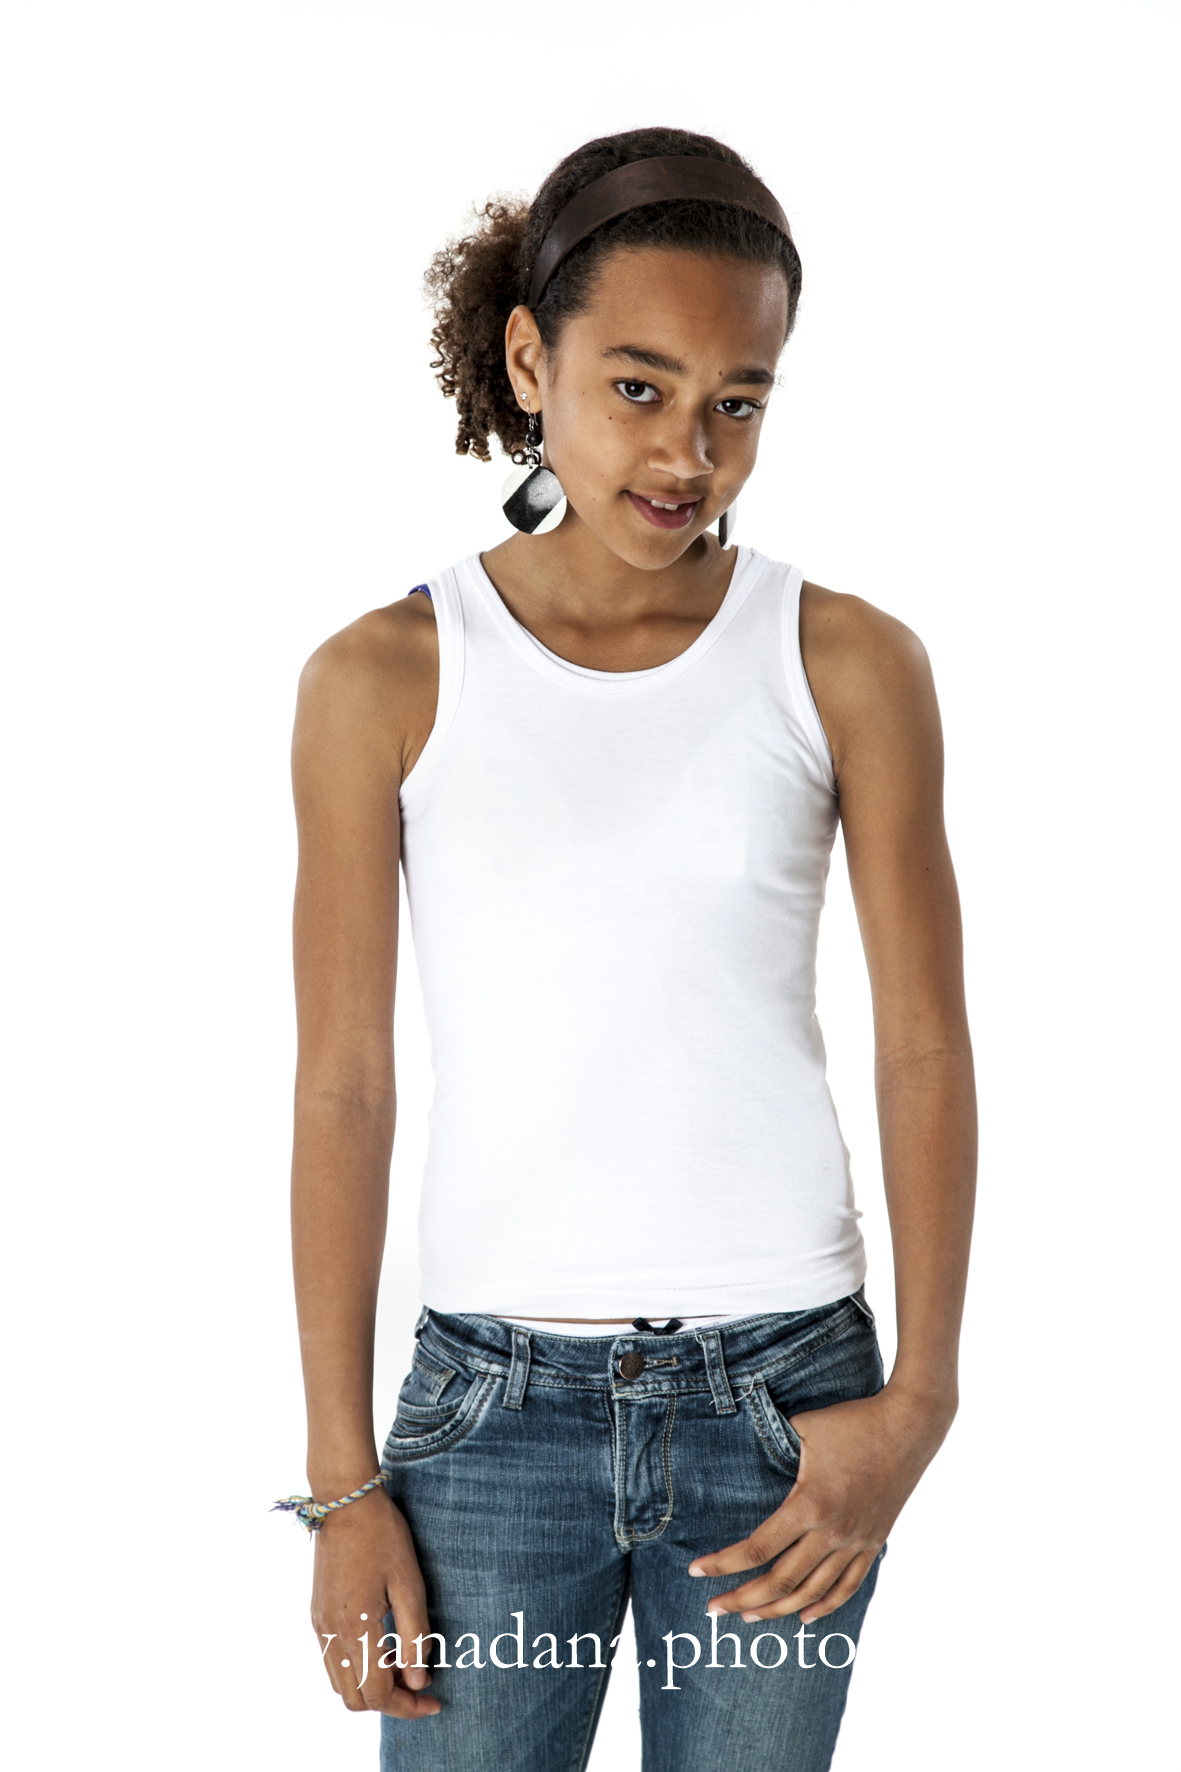 Kostuumvest Op Jeans.White Jeans Janadana Photography